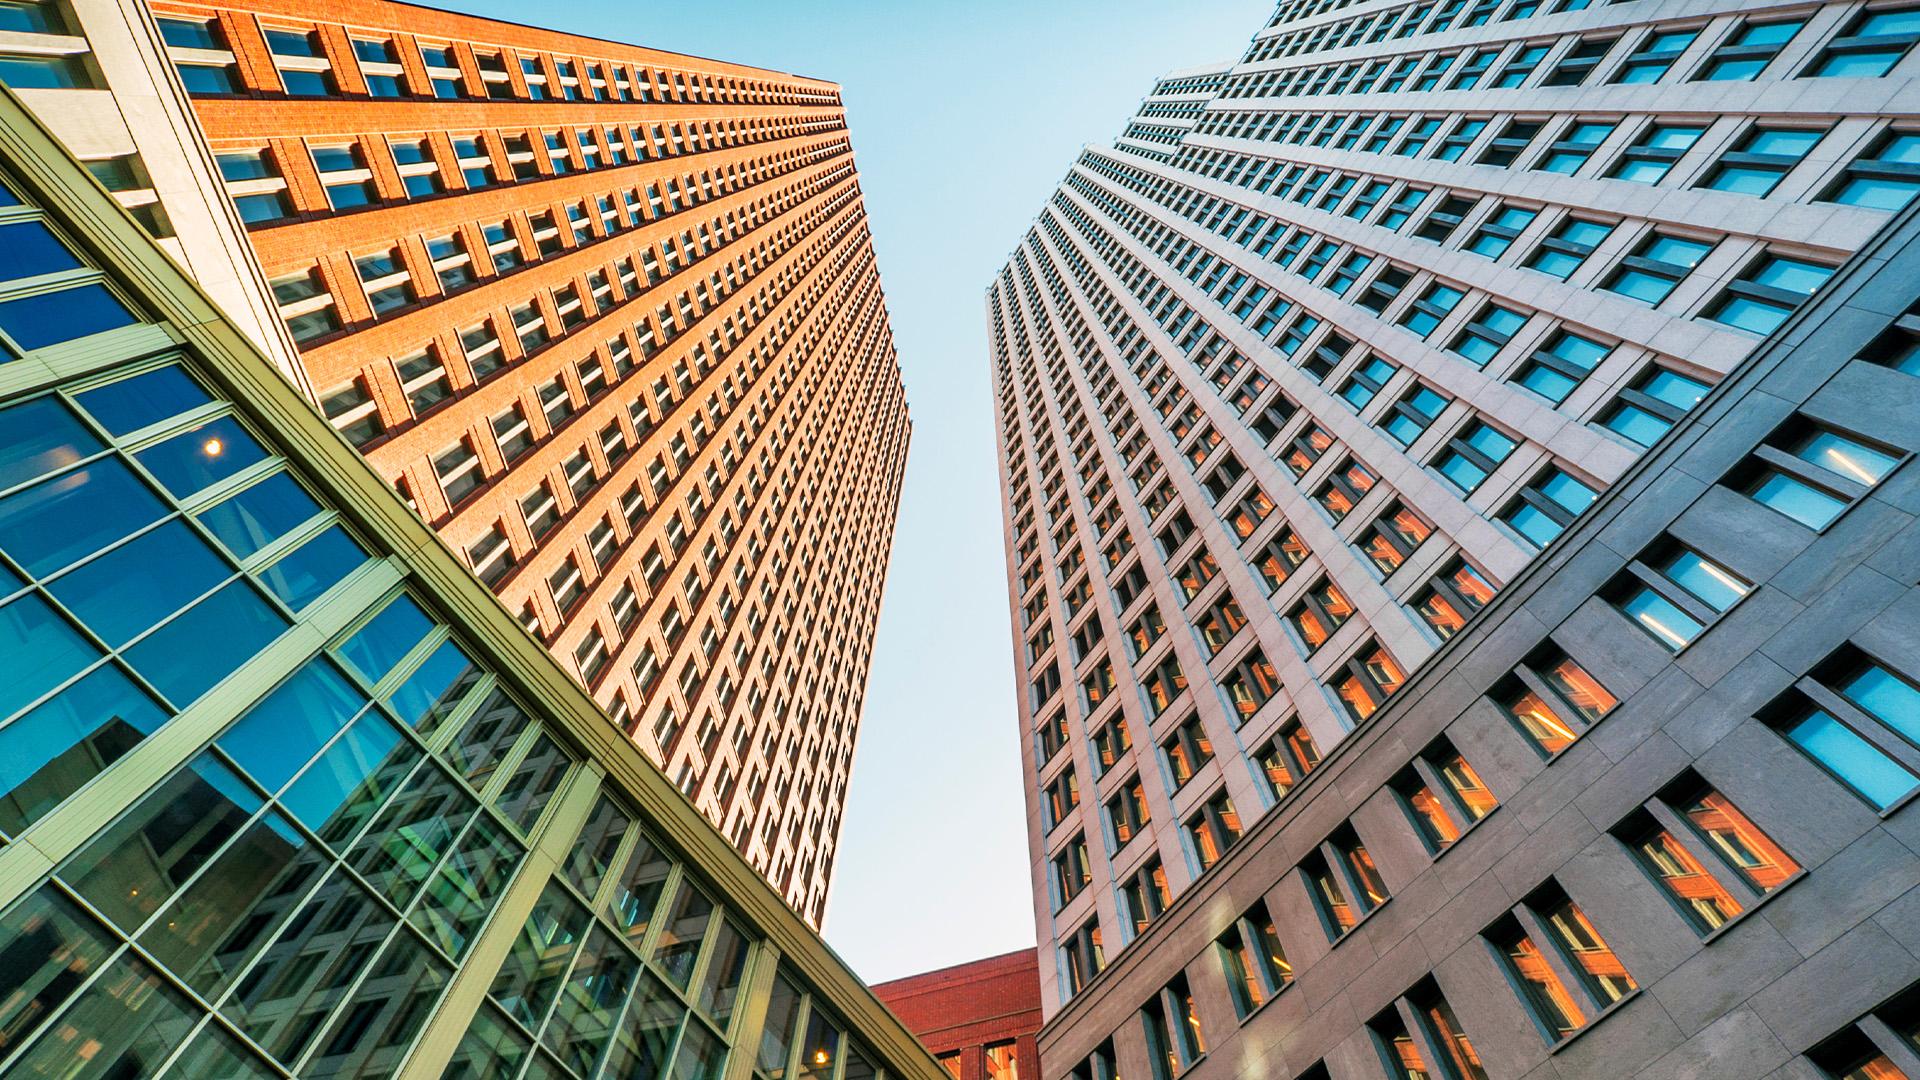 Financial-institution-building-construction-skyscraper-office